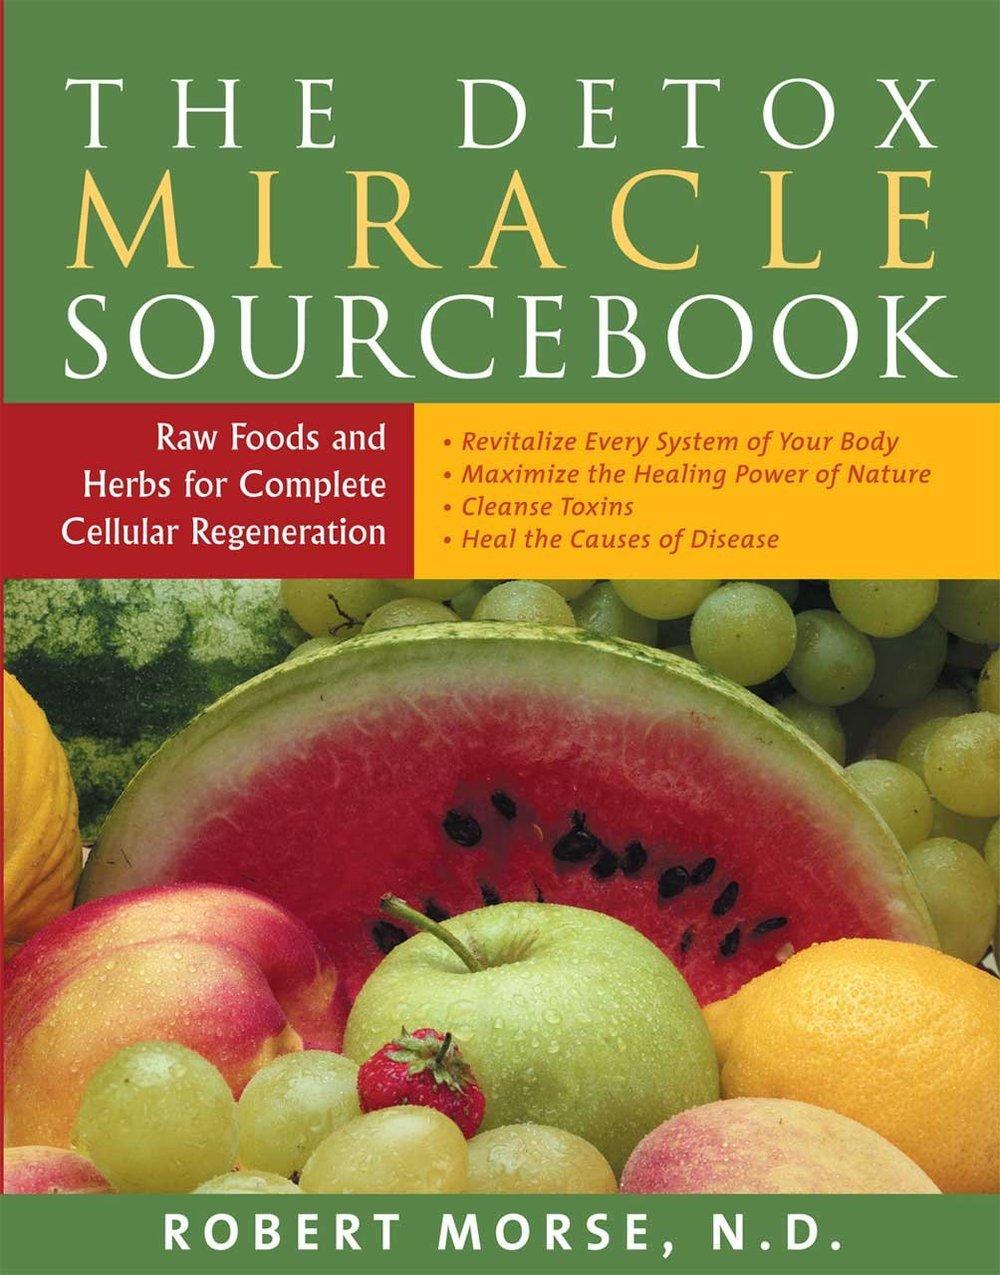 Detox_Miracle_Sourcebook_Robert_Morse_ND